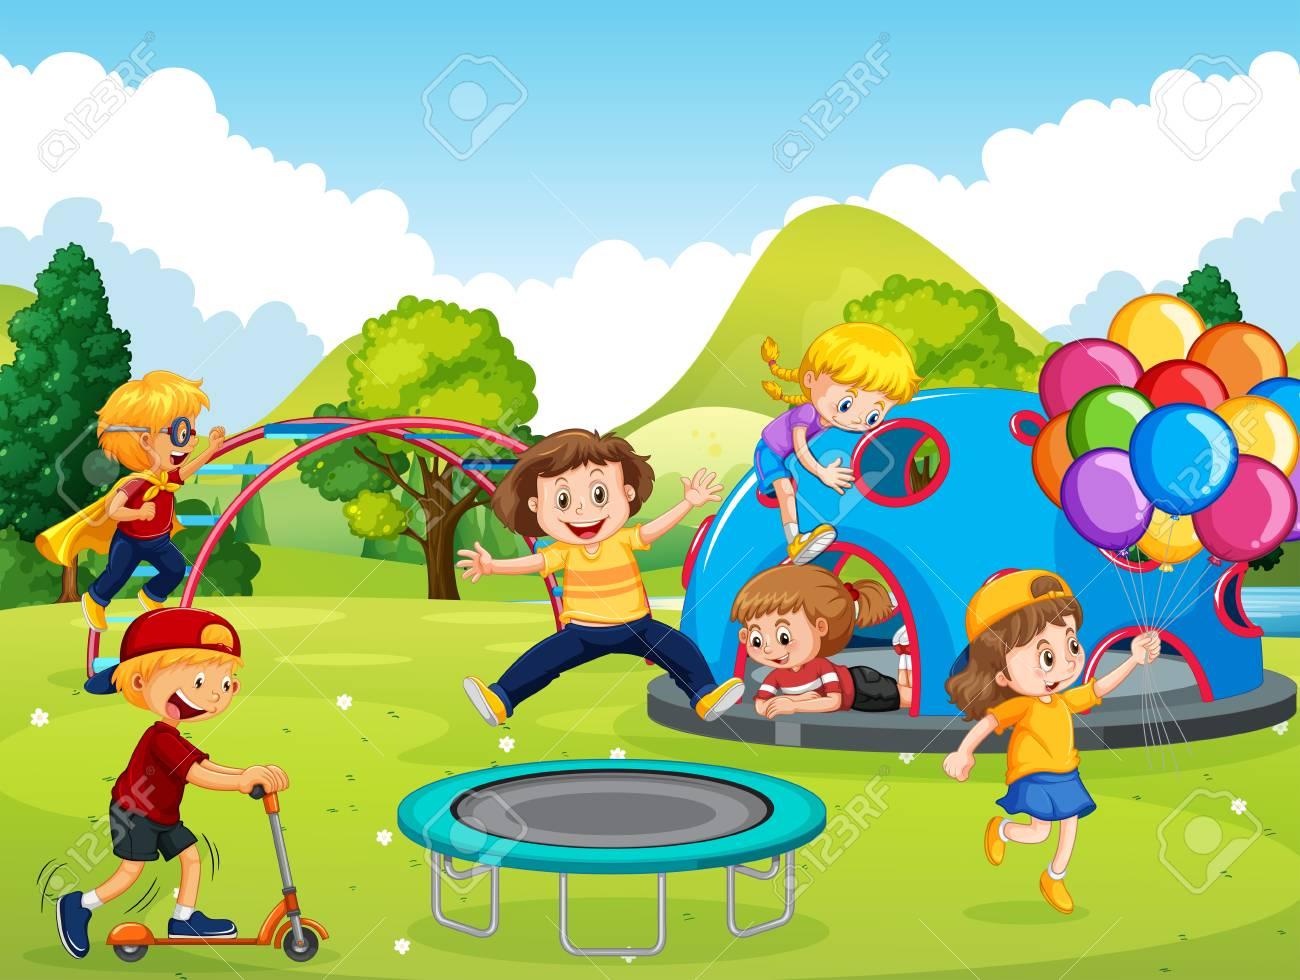 Kids playing in playground illustration - 121750656